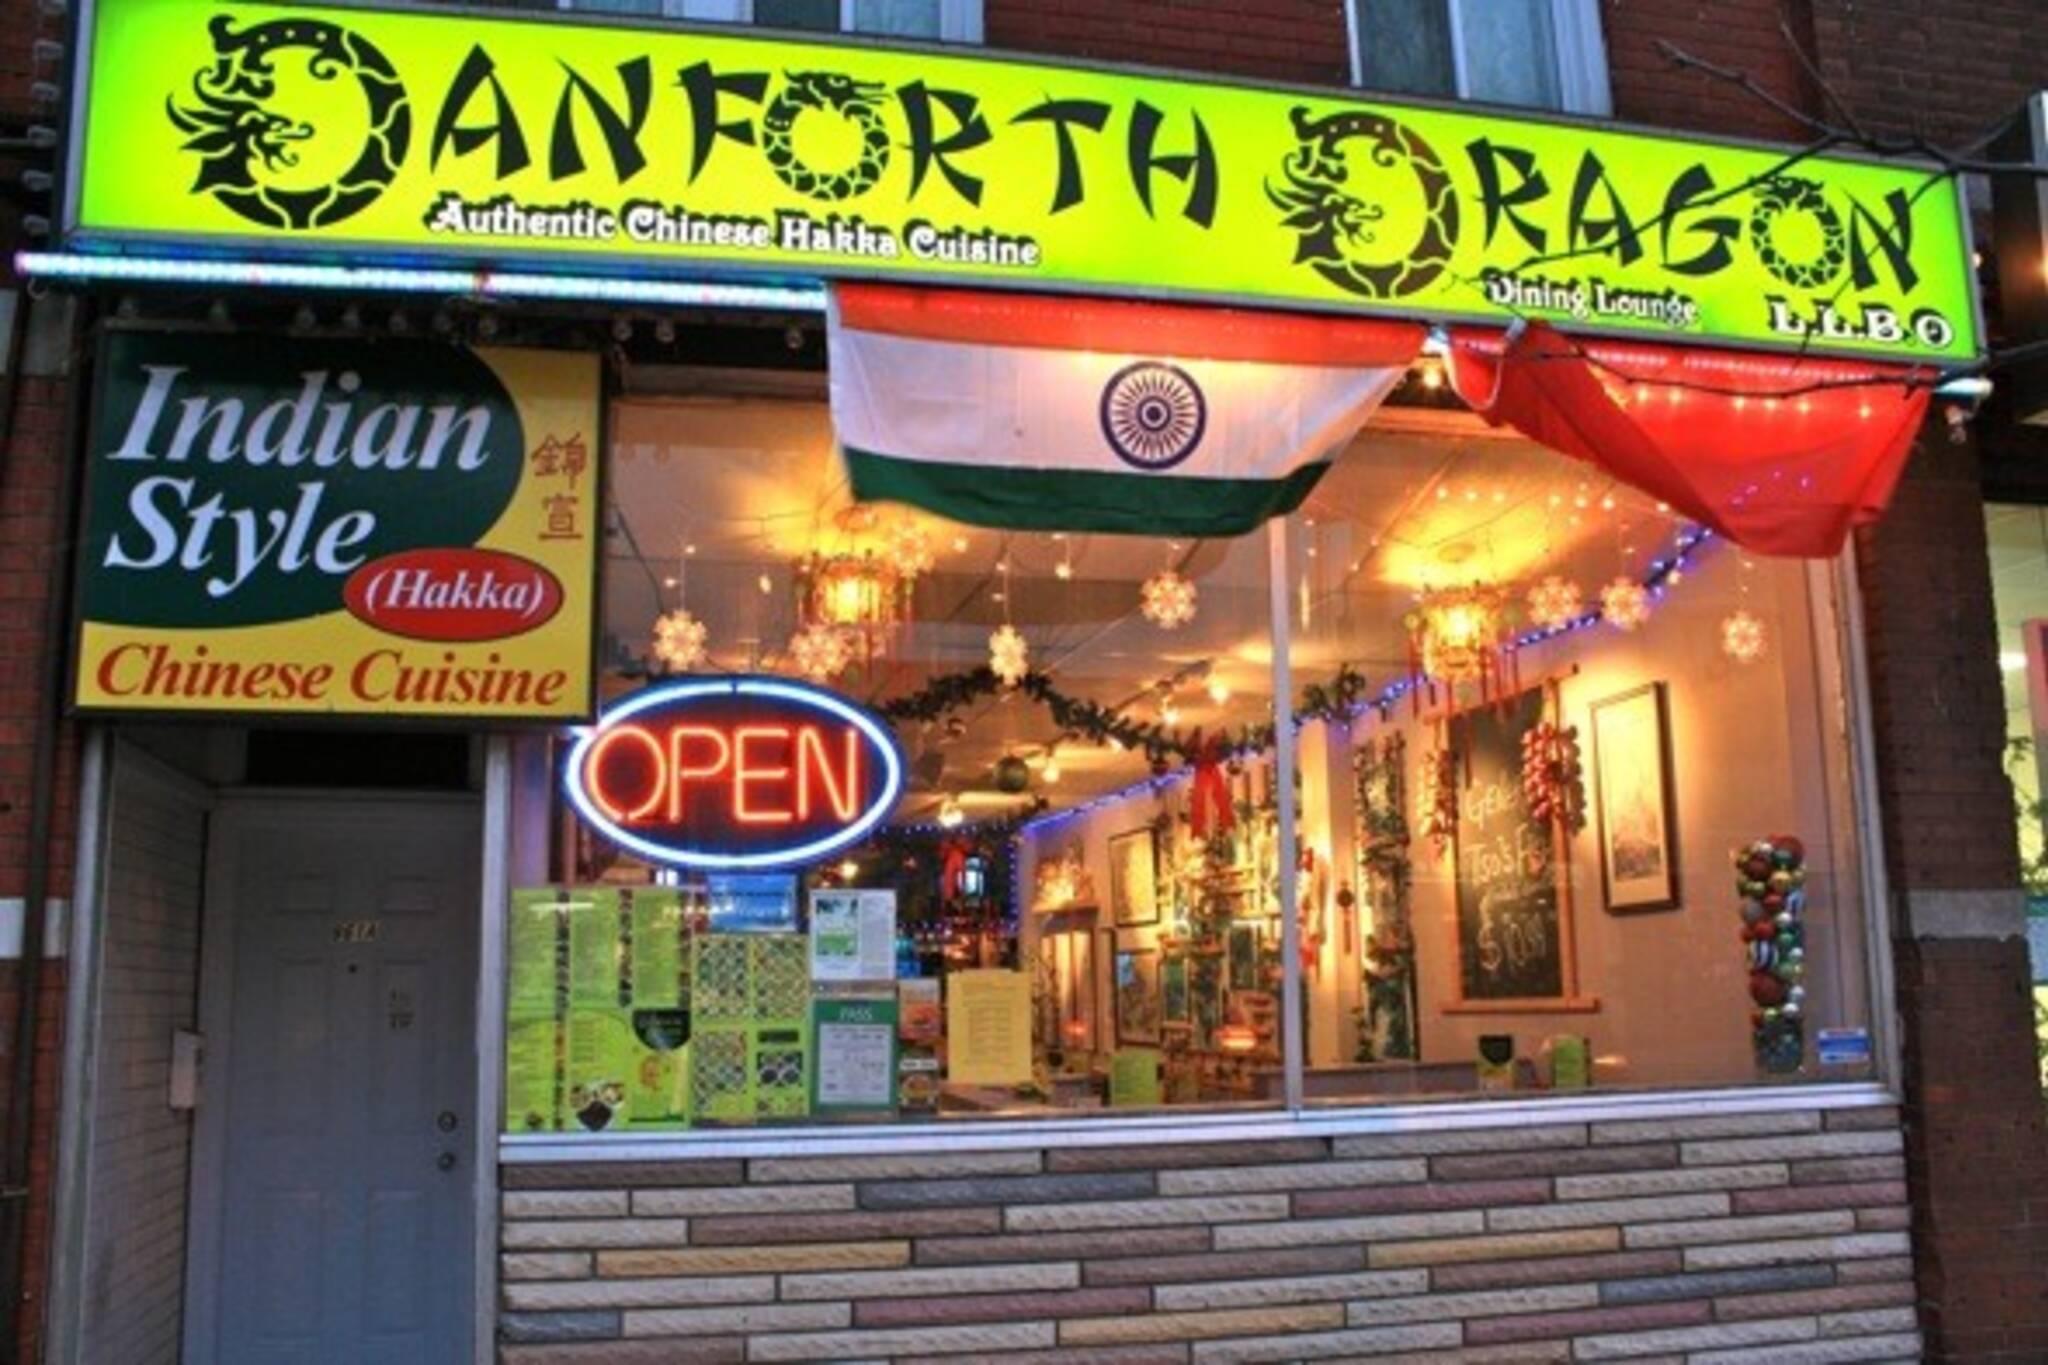 Danforth Dragon